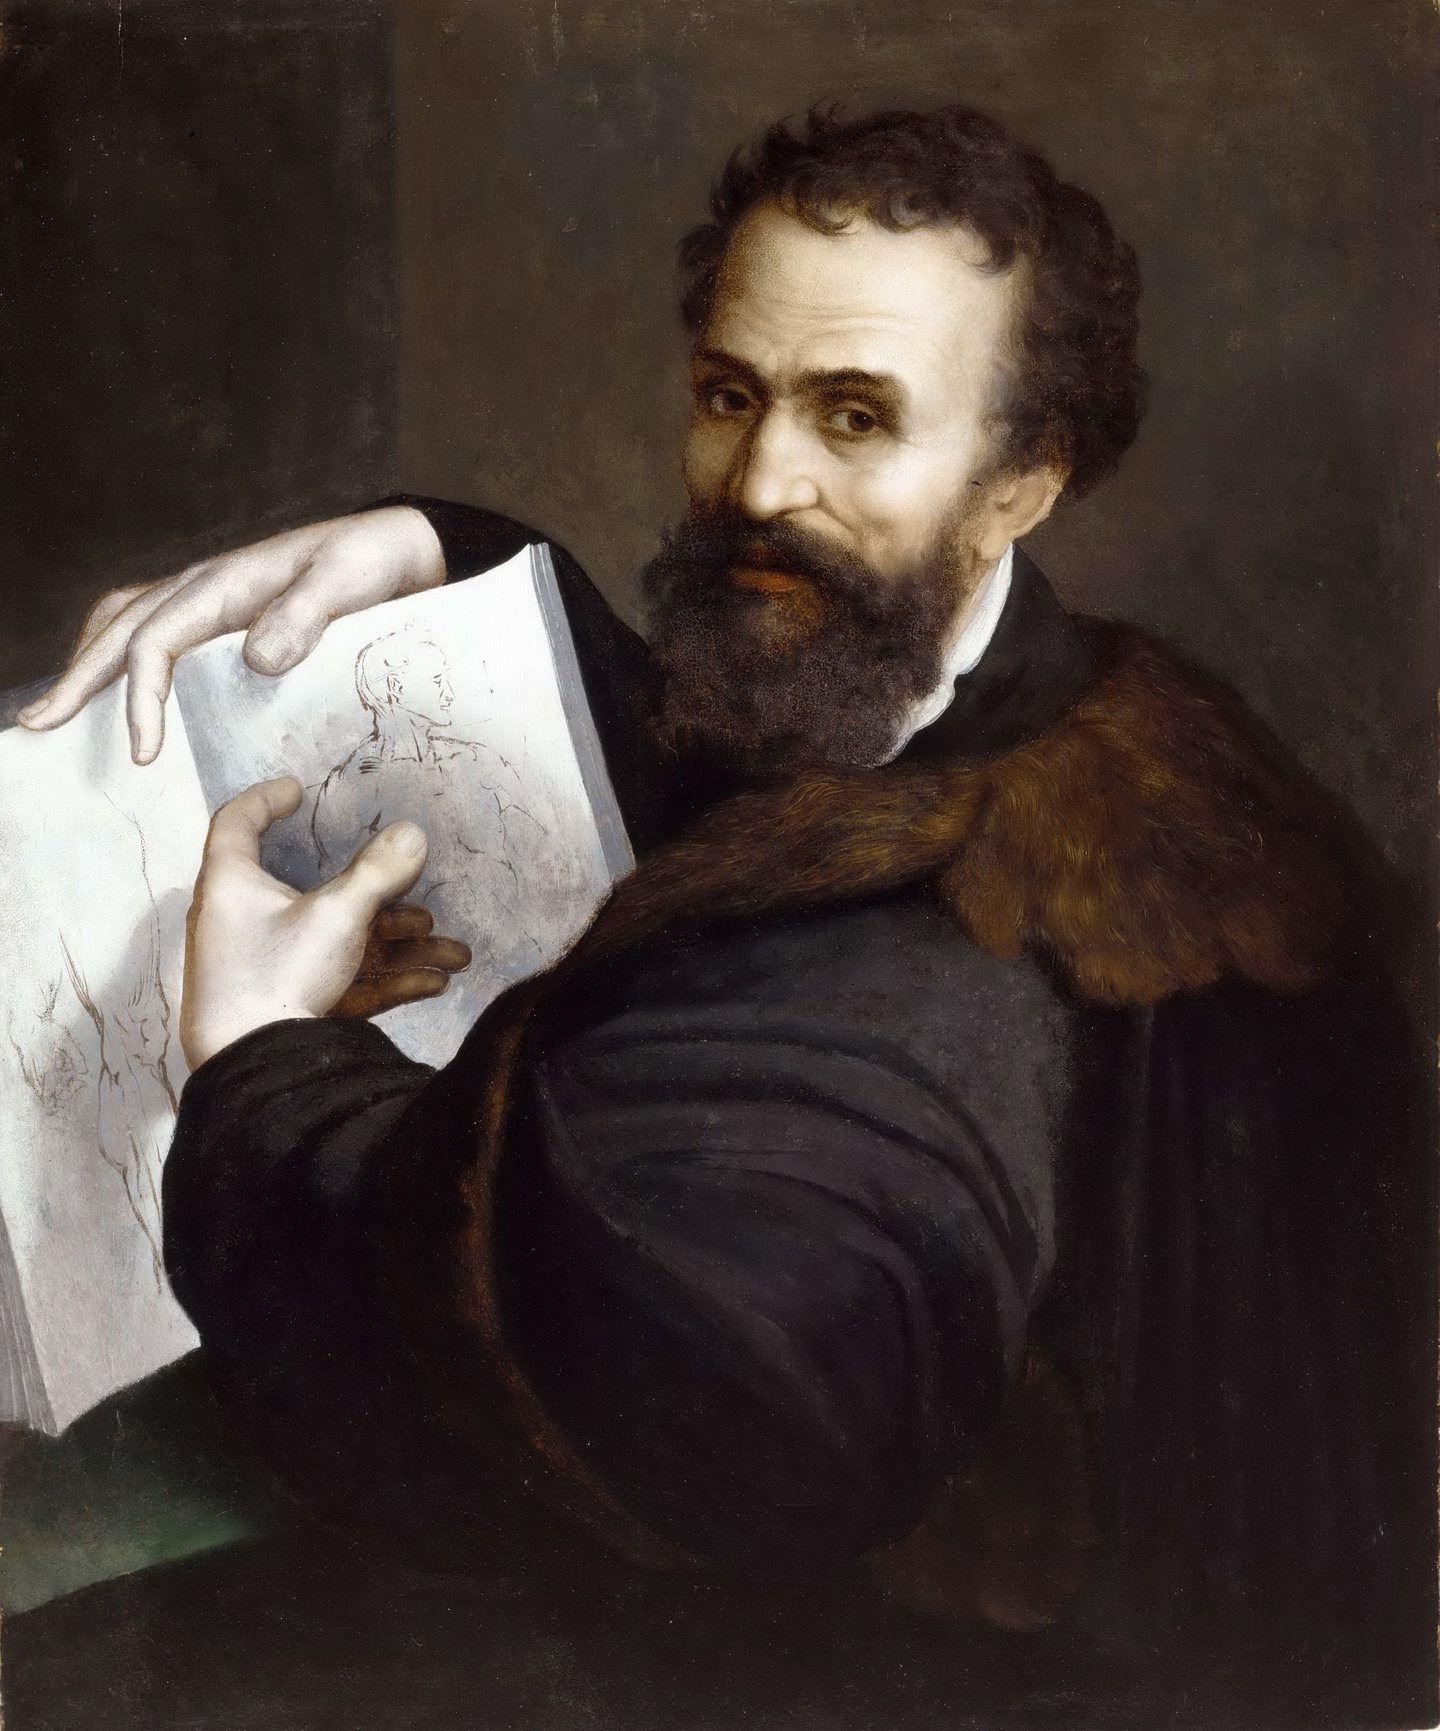 Seniman Renaissance Michelangelo